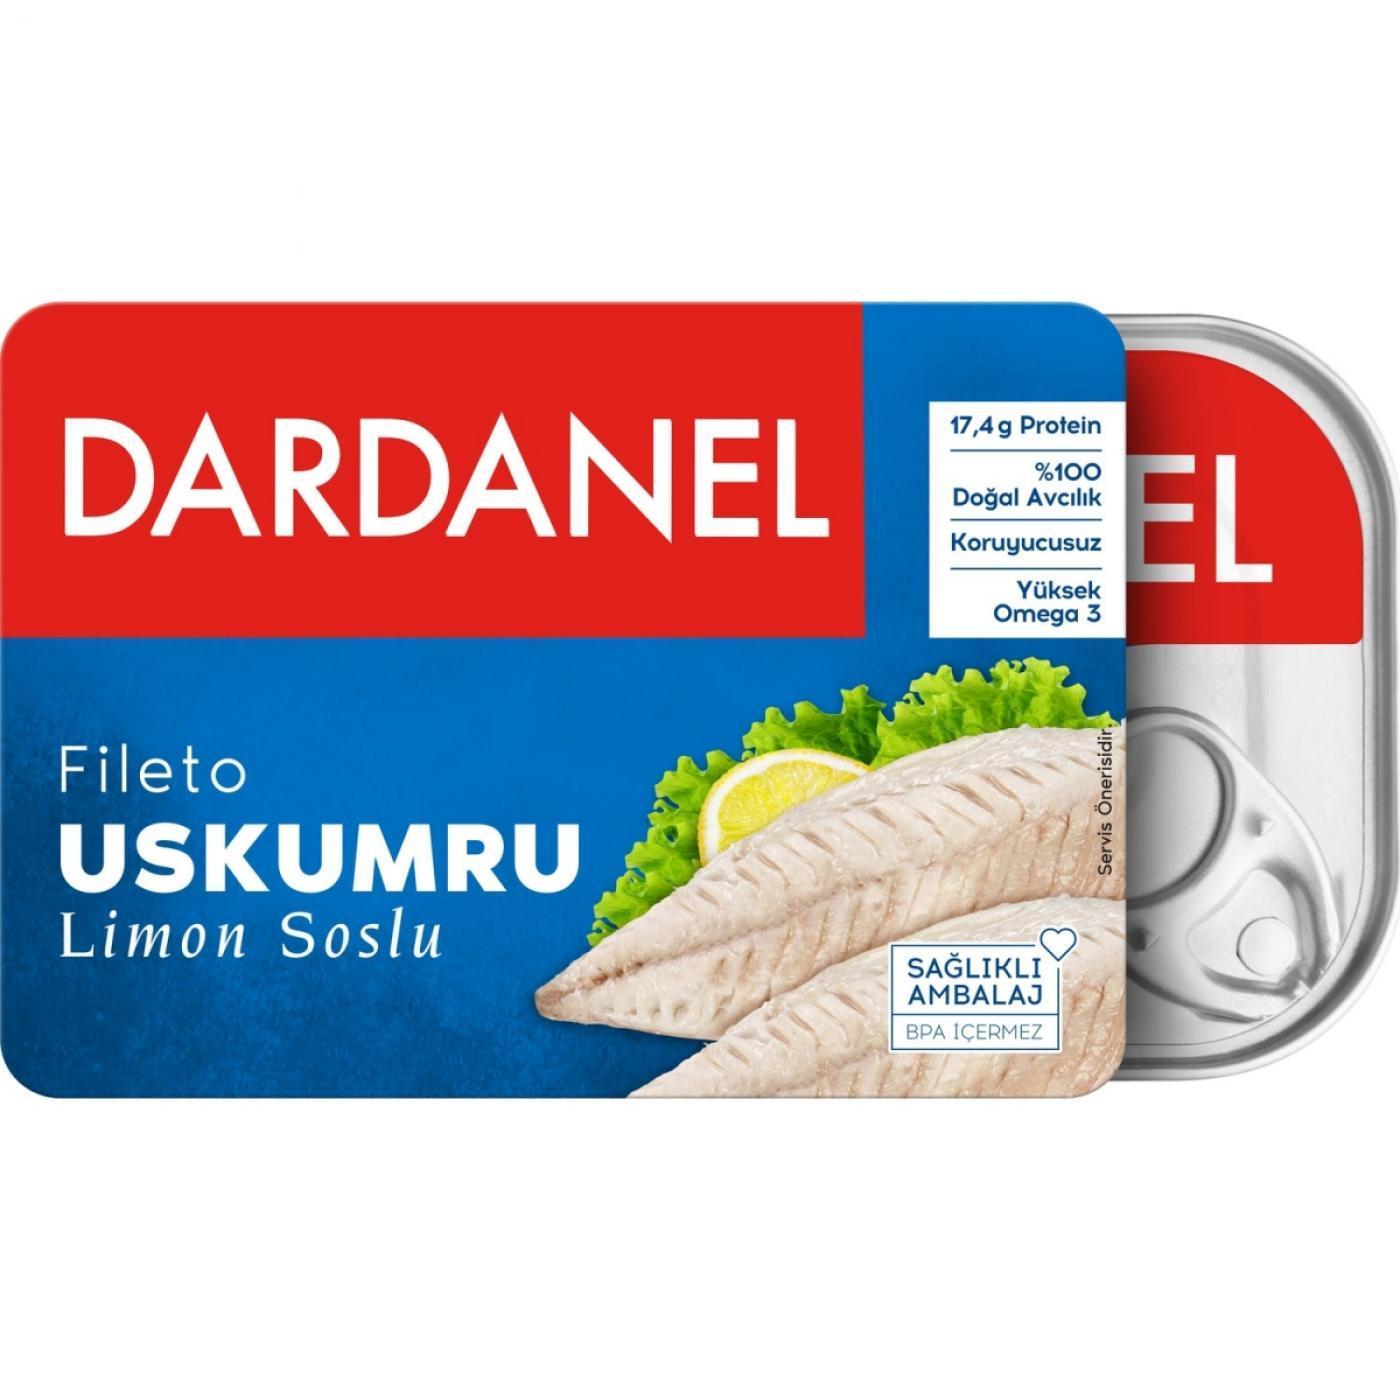 DARDANEL 100GR USKUMRU